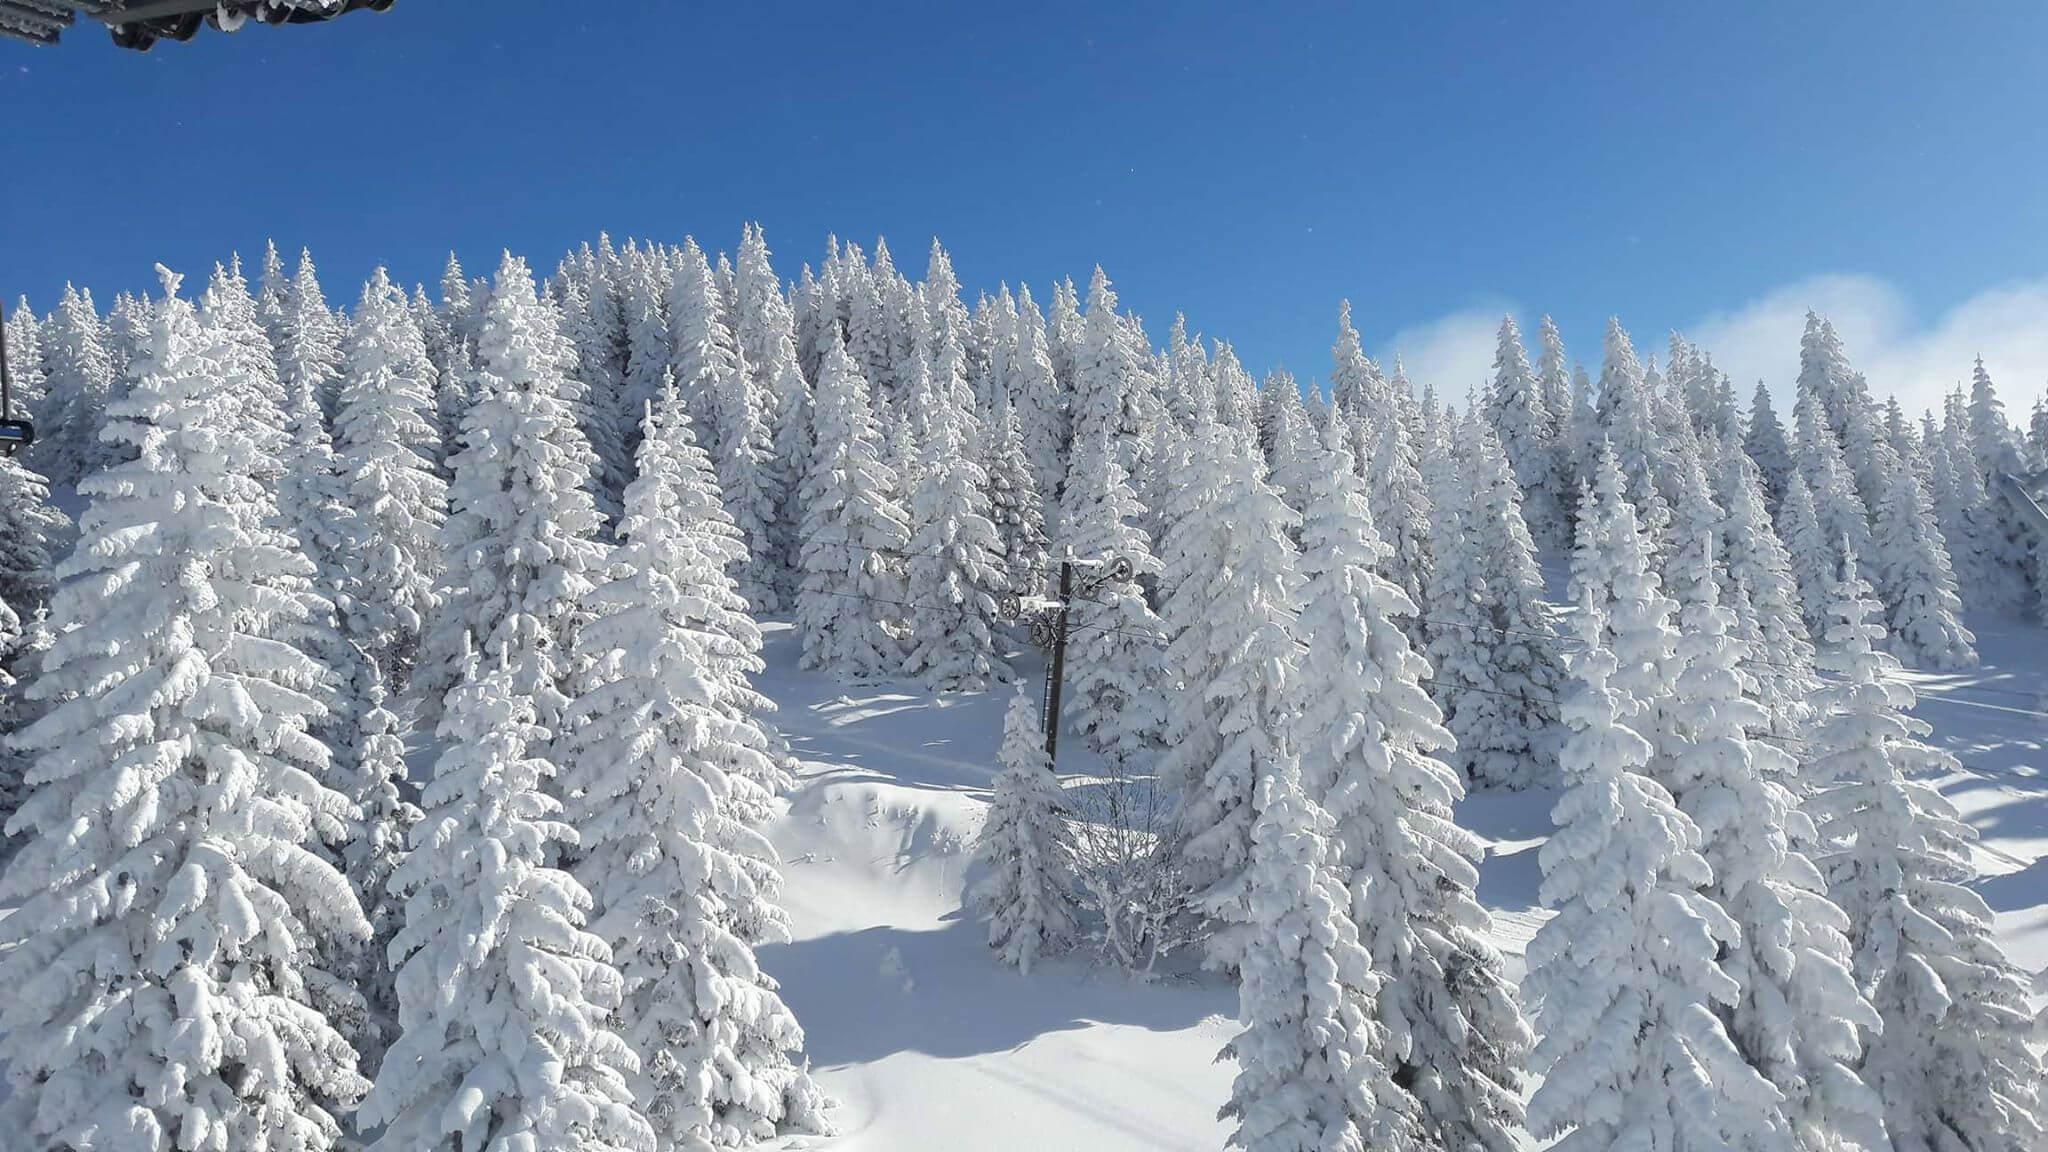 Snežna idila na Kopaoniku (5) - 21. decembar 2017